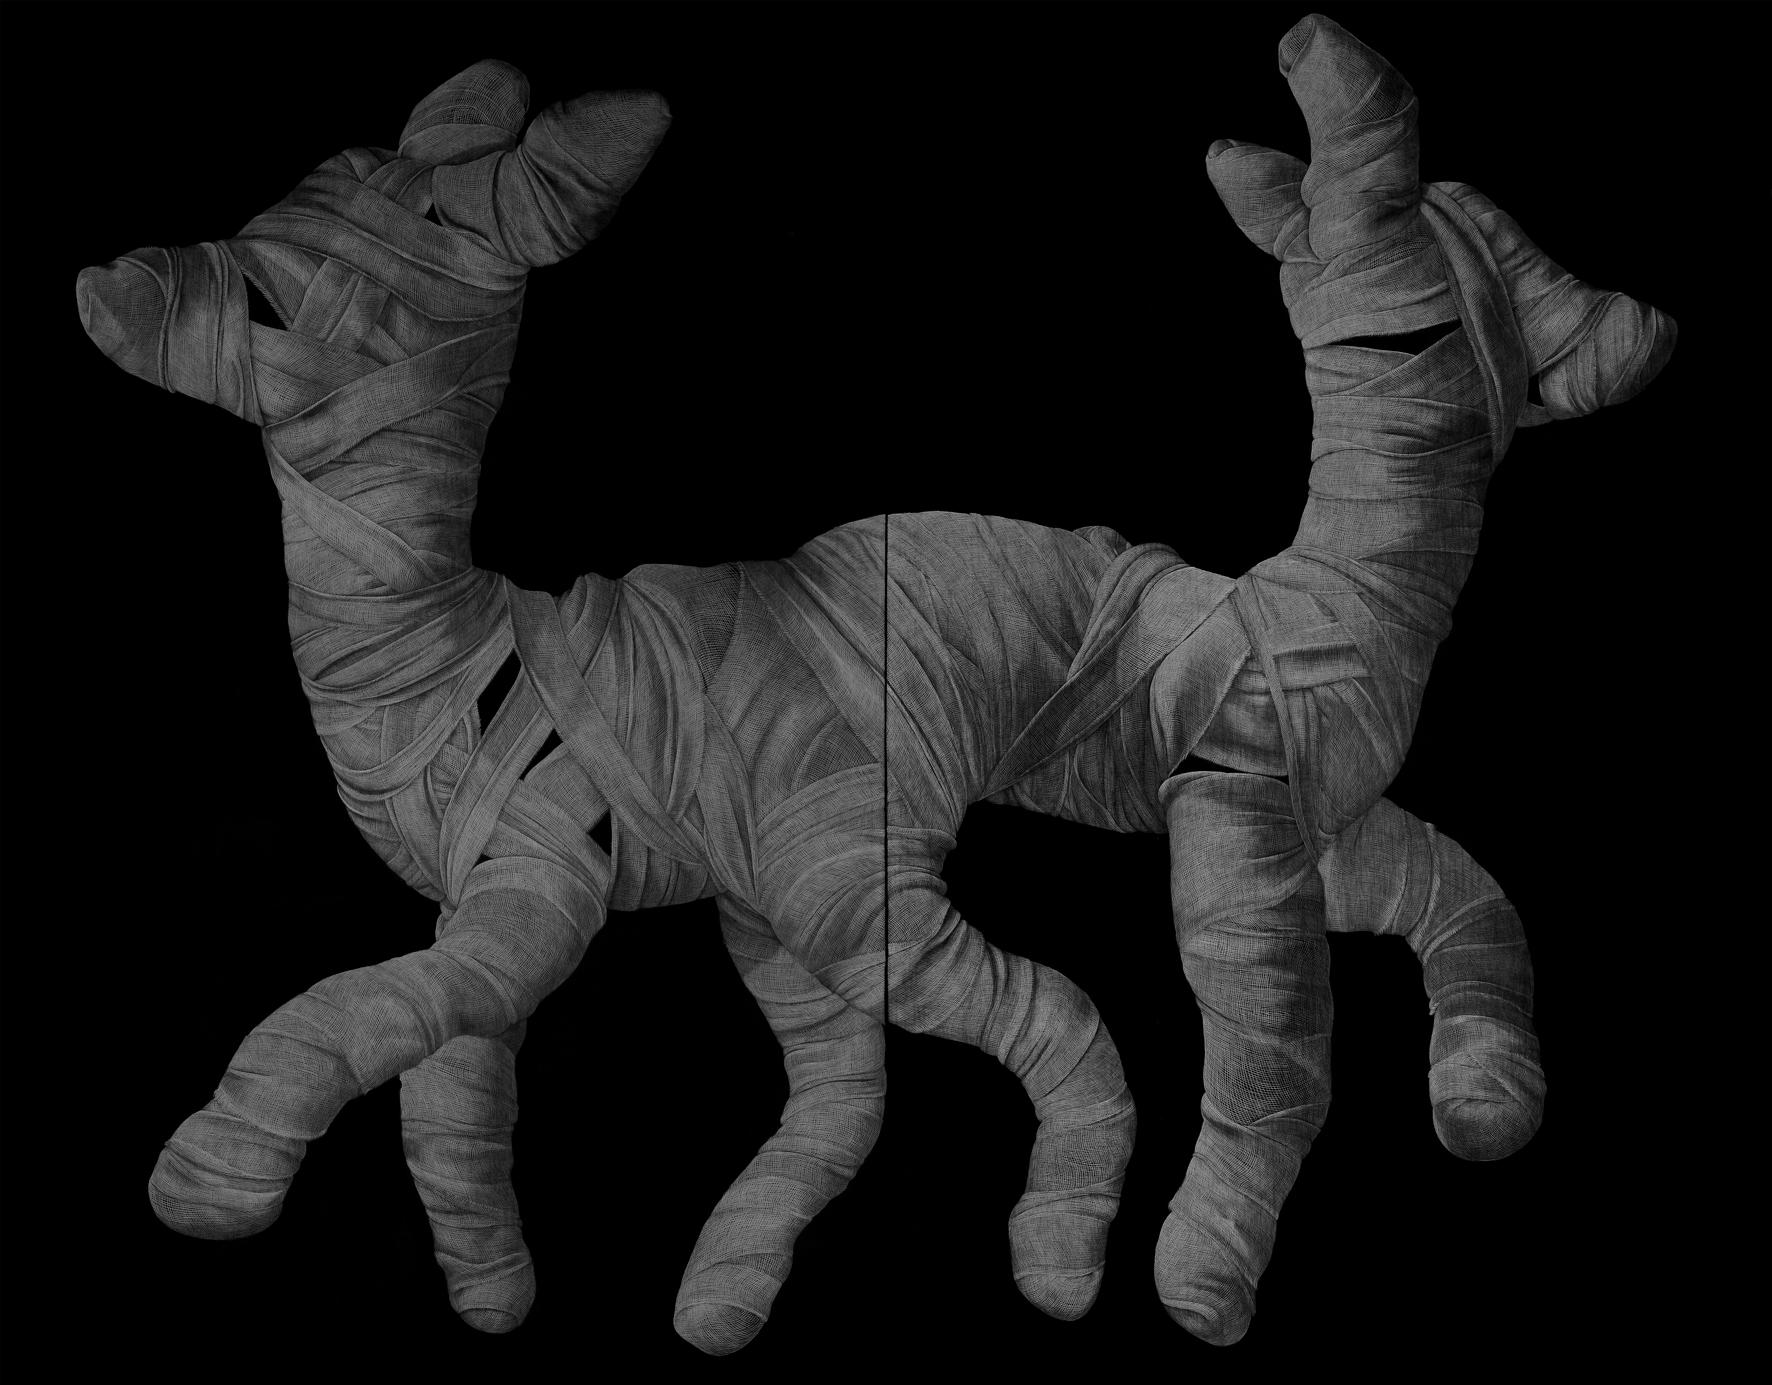 Adeel uz-Zafar  Drawing Appendage  (Diptych) 2014 Engraved drawing on vinyl H243.8 x W305 cm